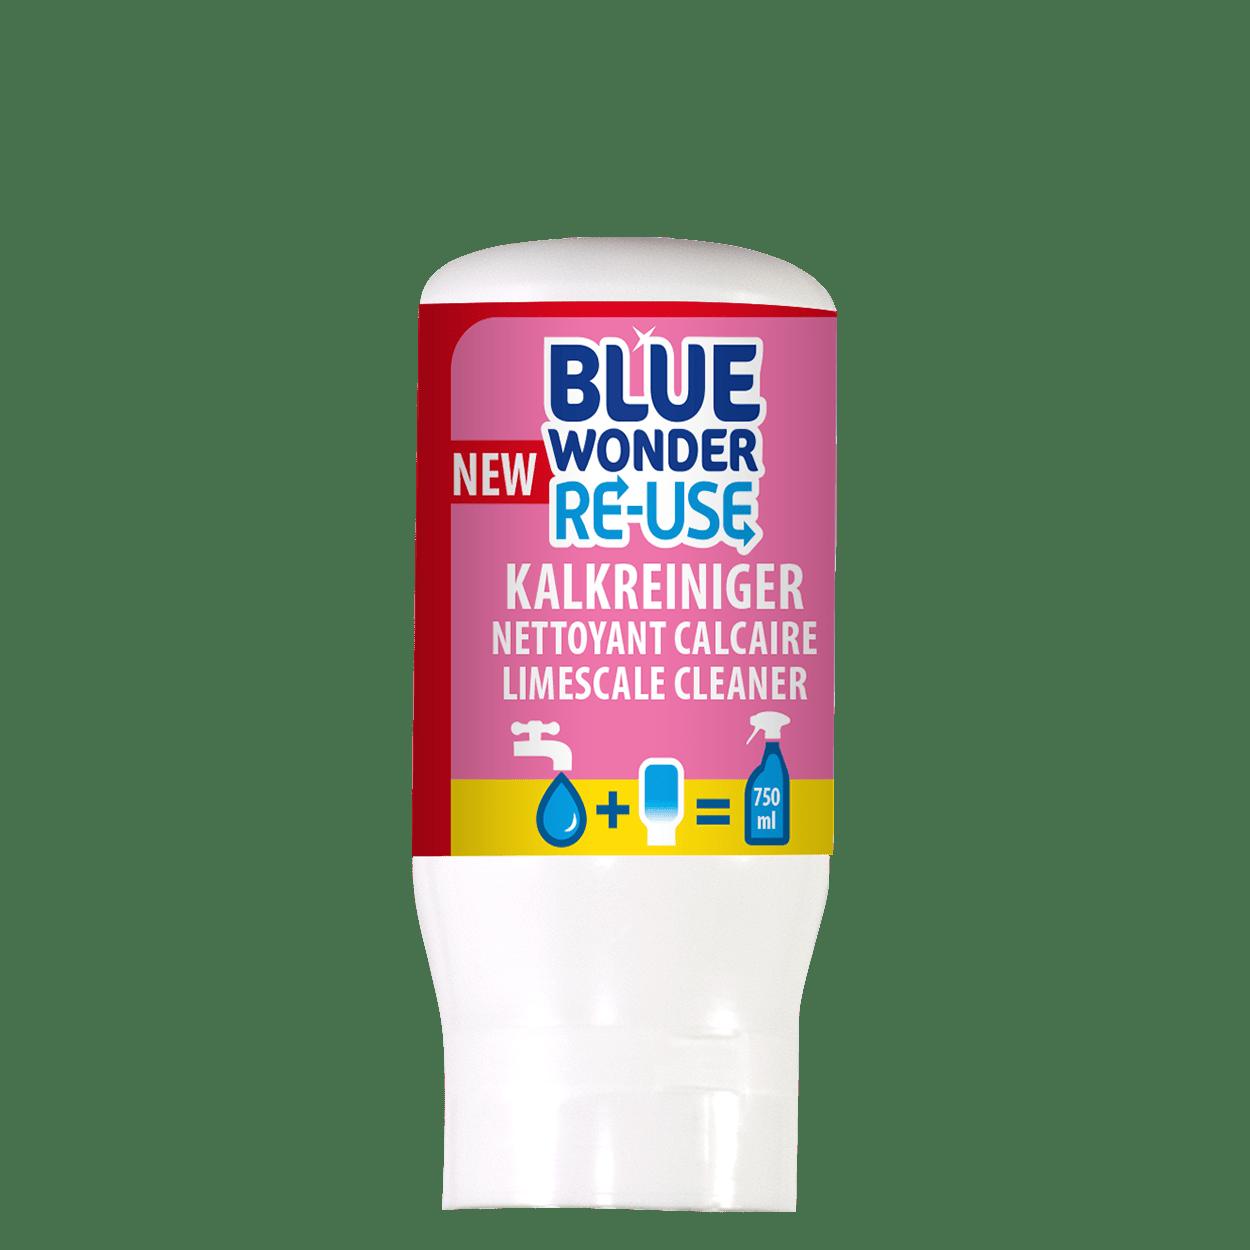 8712038001981 Blue Wonder Kalkreiniger_refill capsule_102020